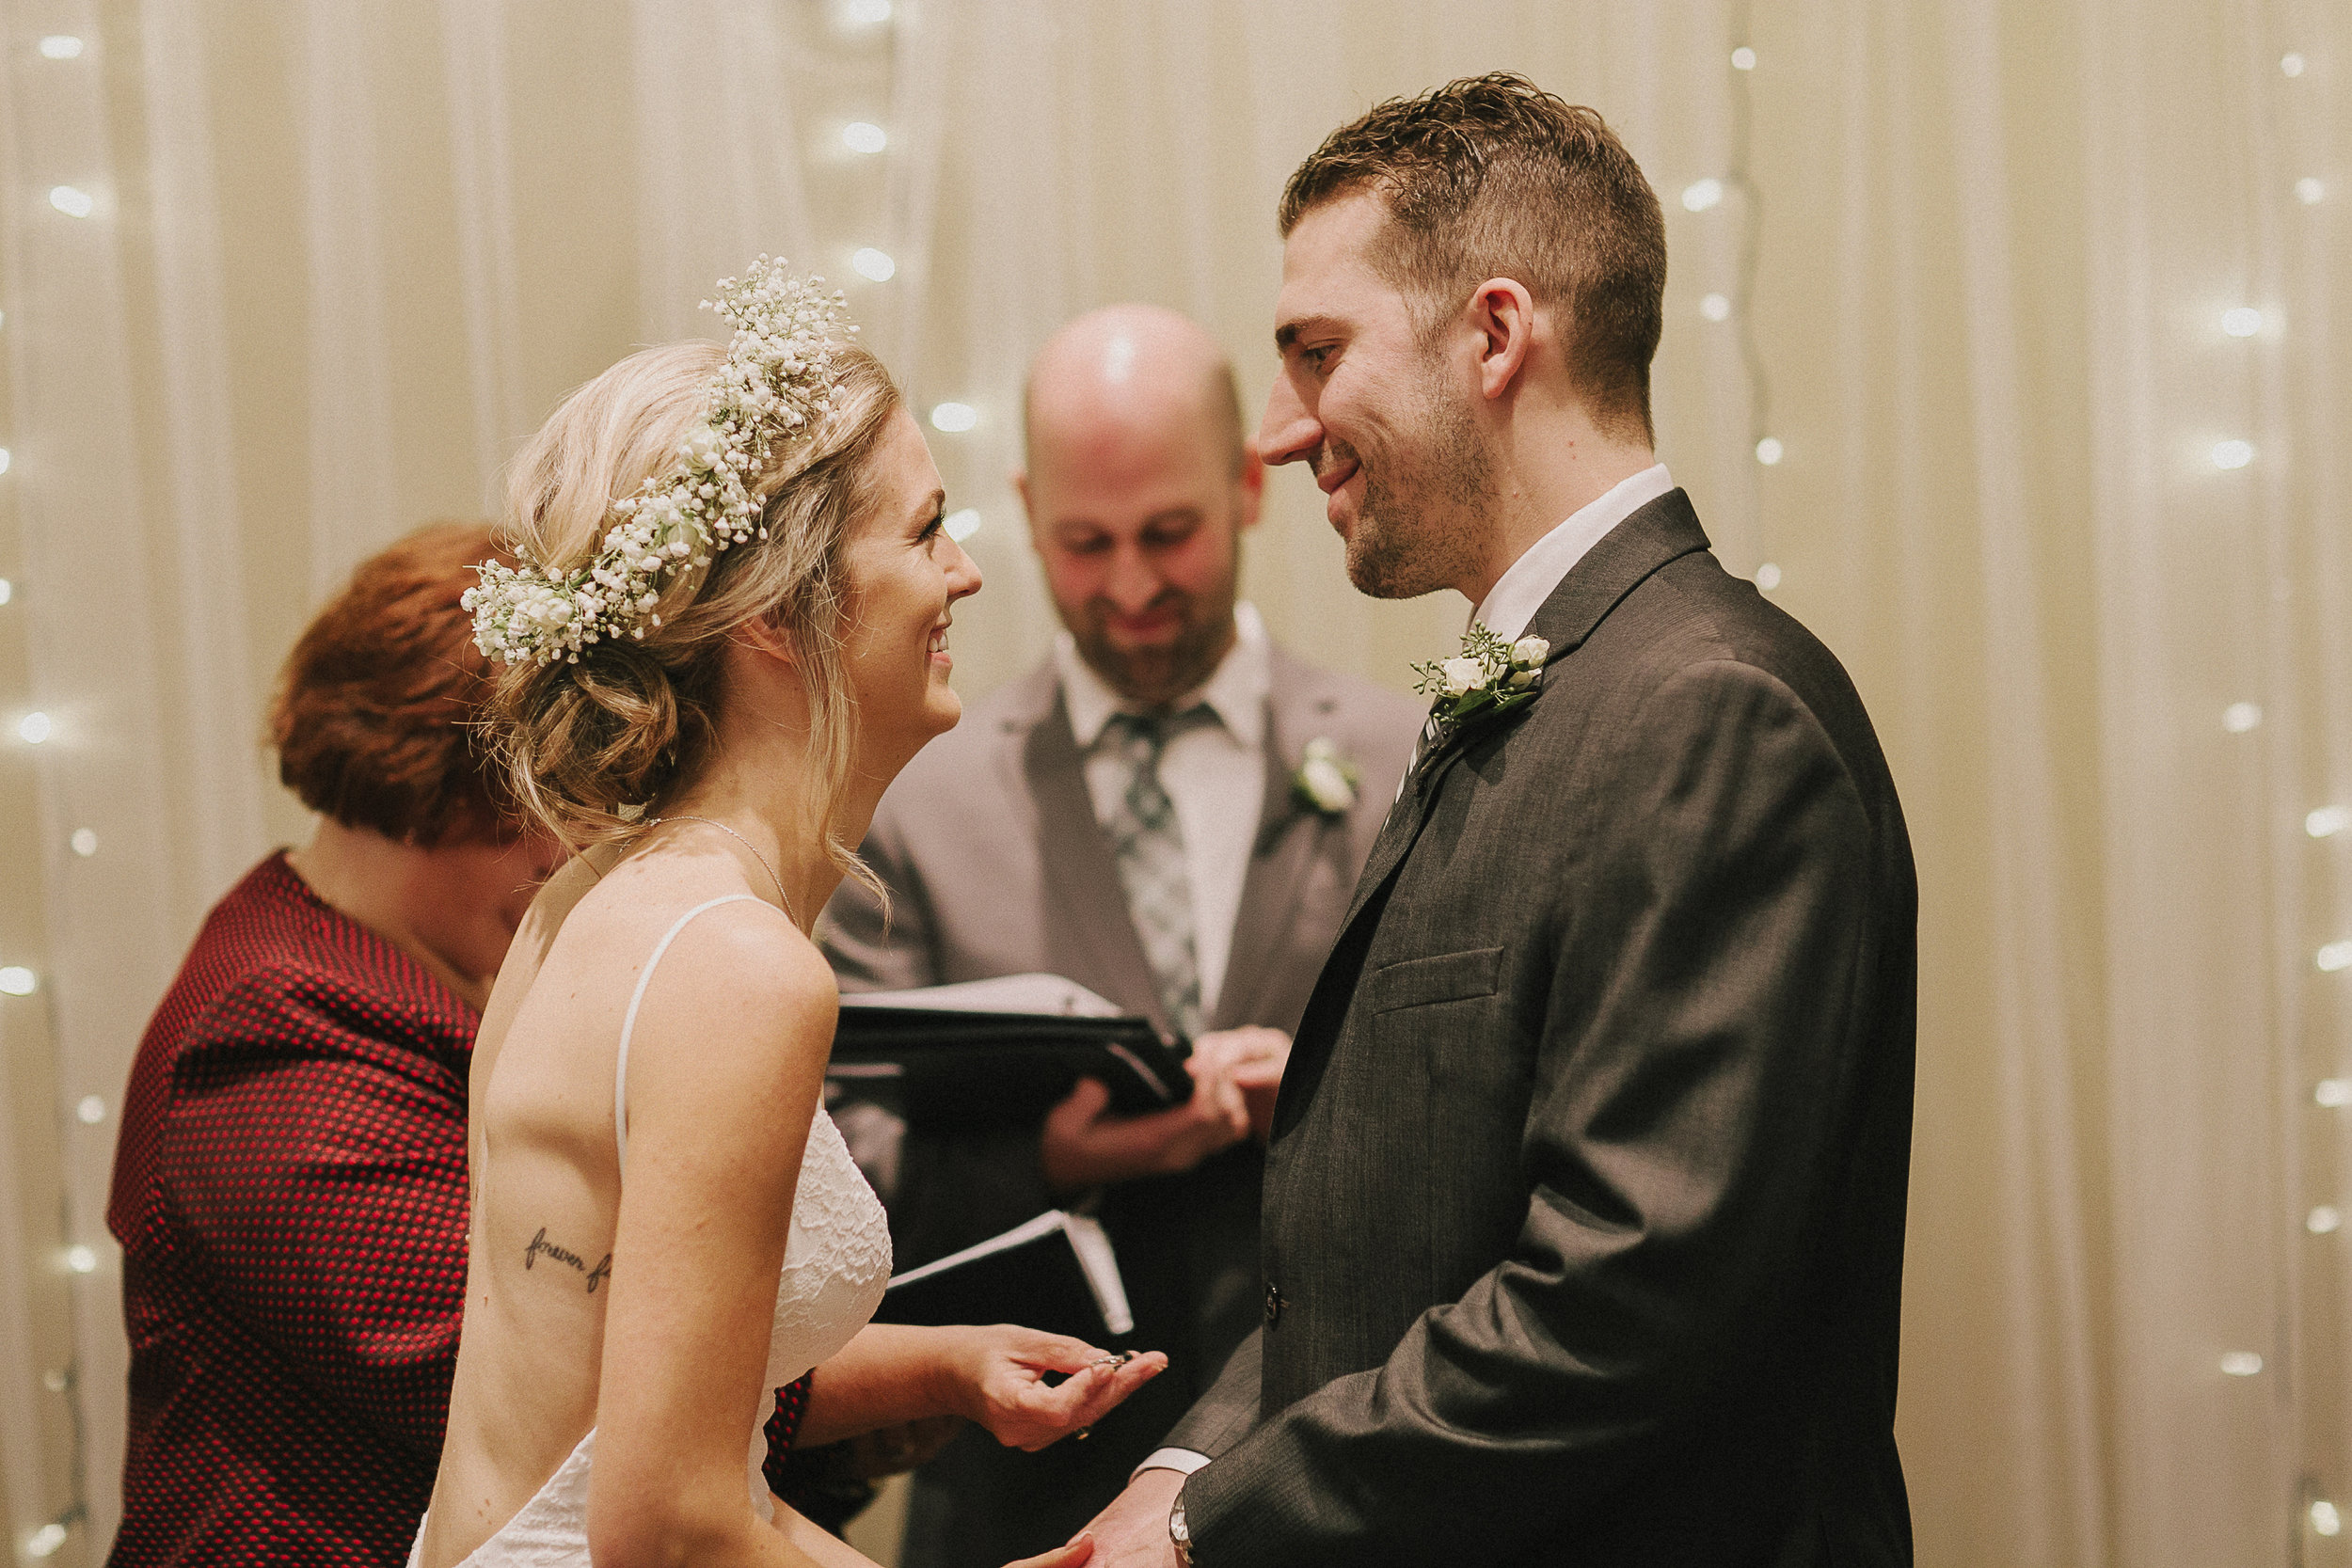 mark-and-liz-wedding-283.jpg